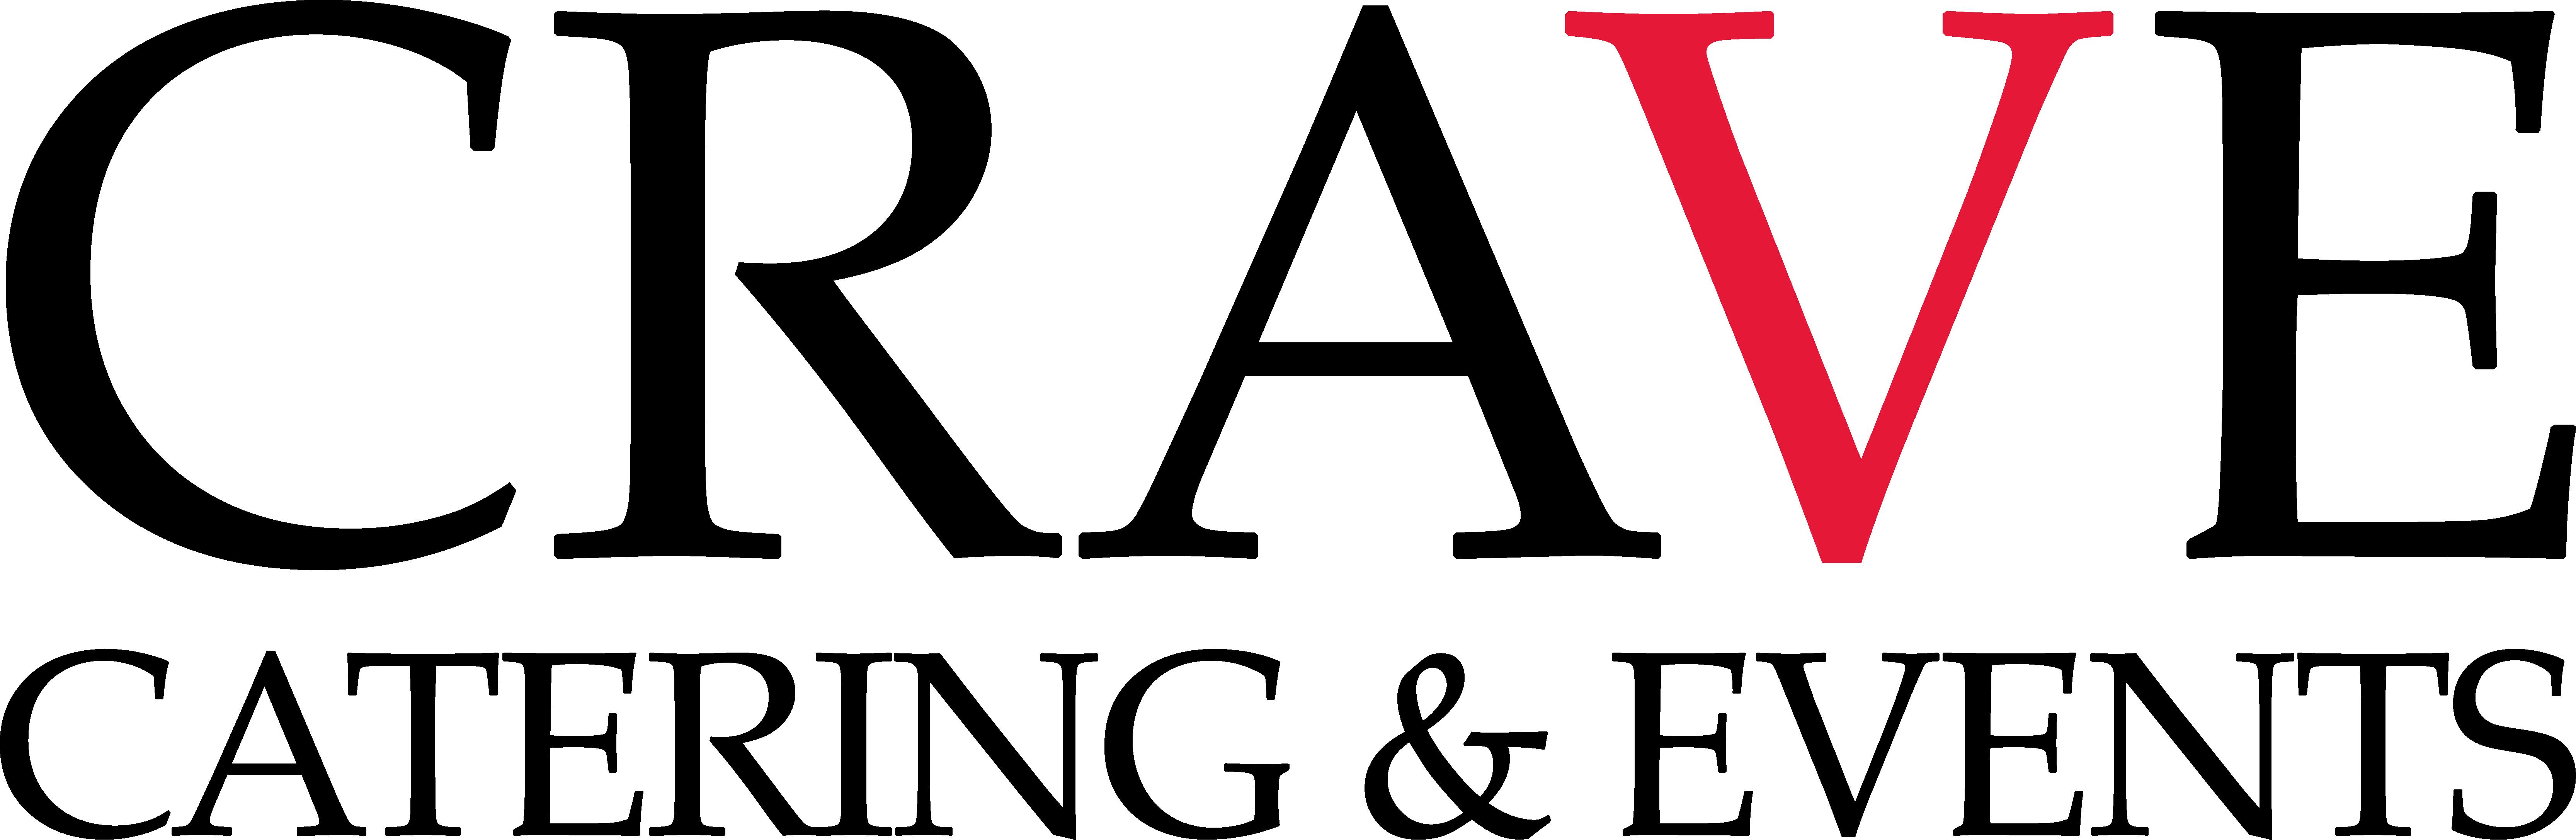 CRAVE_CateringEvents_Logo_Black_RedV_Transparent